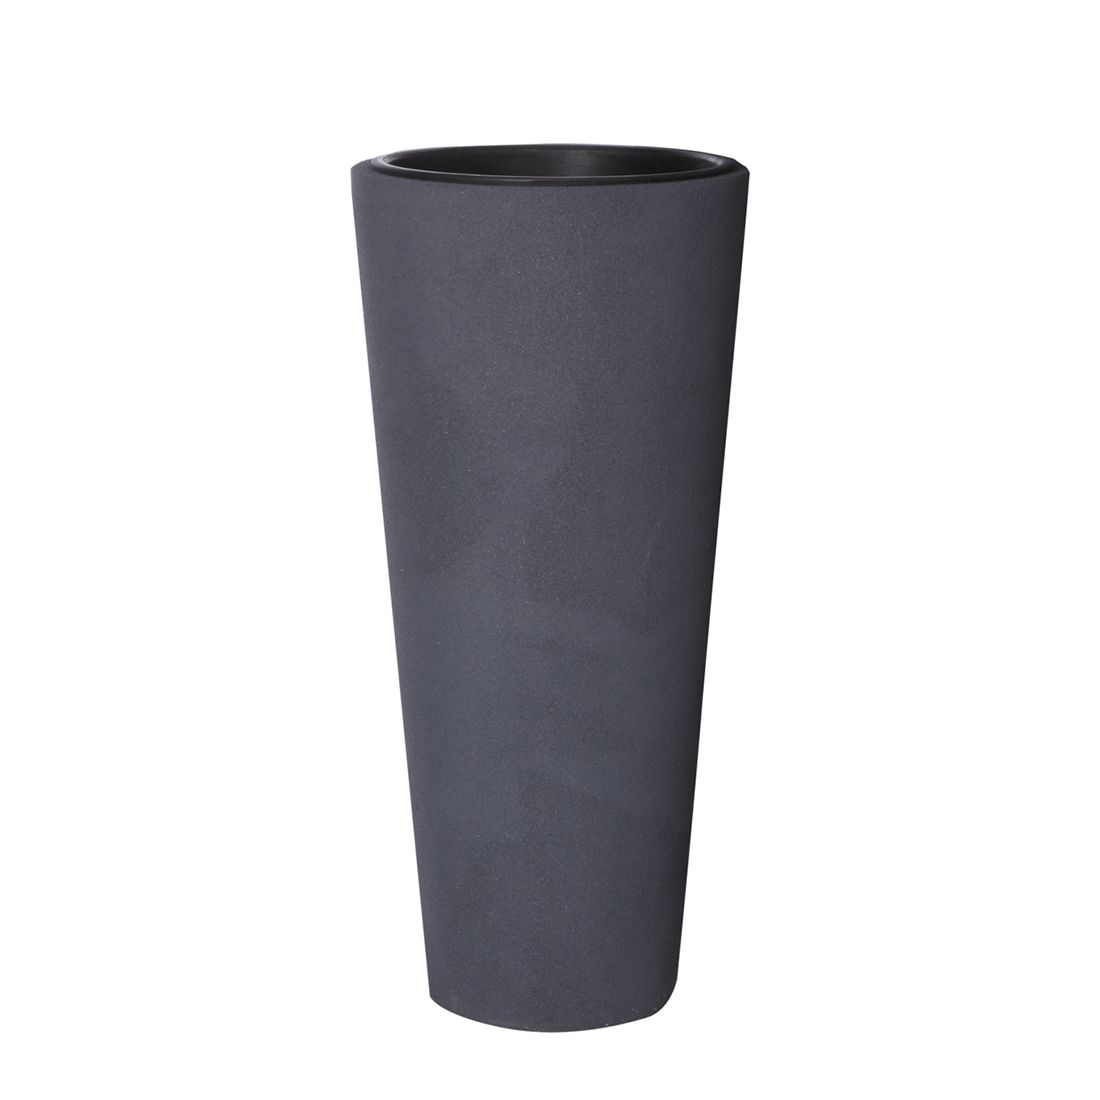 pflanzk bel 28 x 60 cm fiberglas grau strukturiert gartenfreude jetzt bestellen. Black Bedroom Furniture Sets. Home Design Ideas